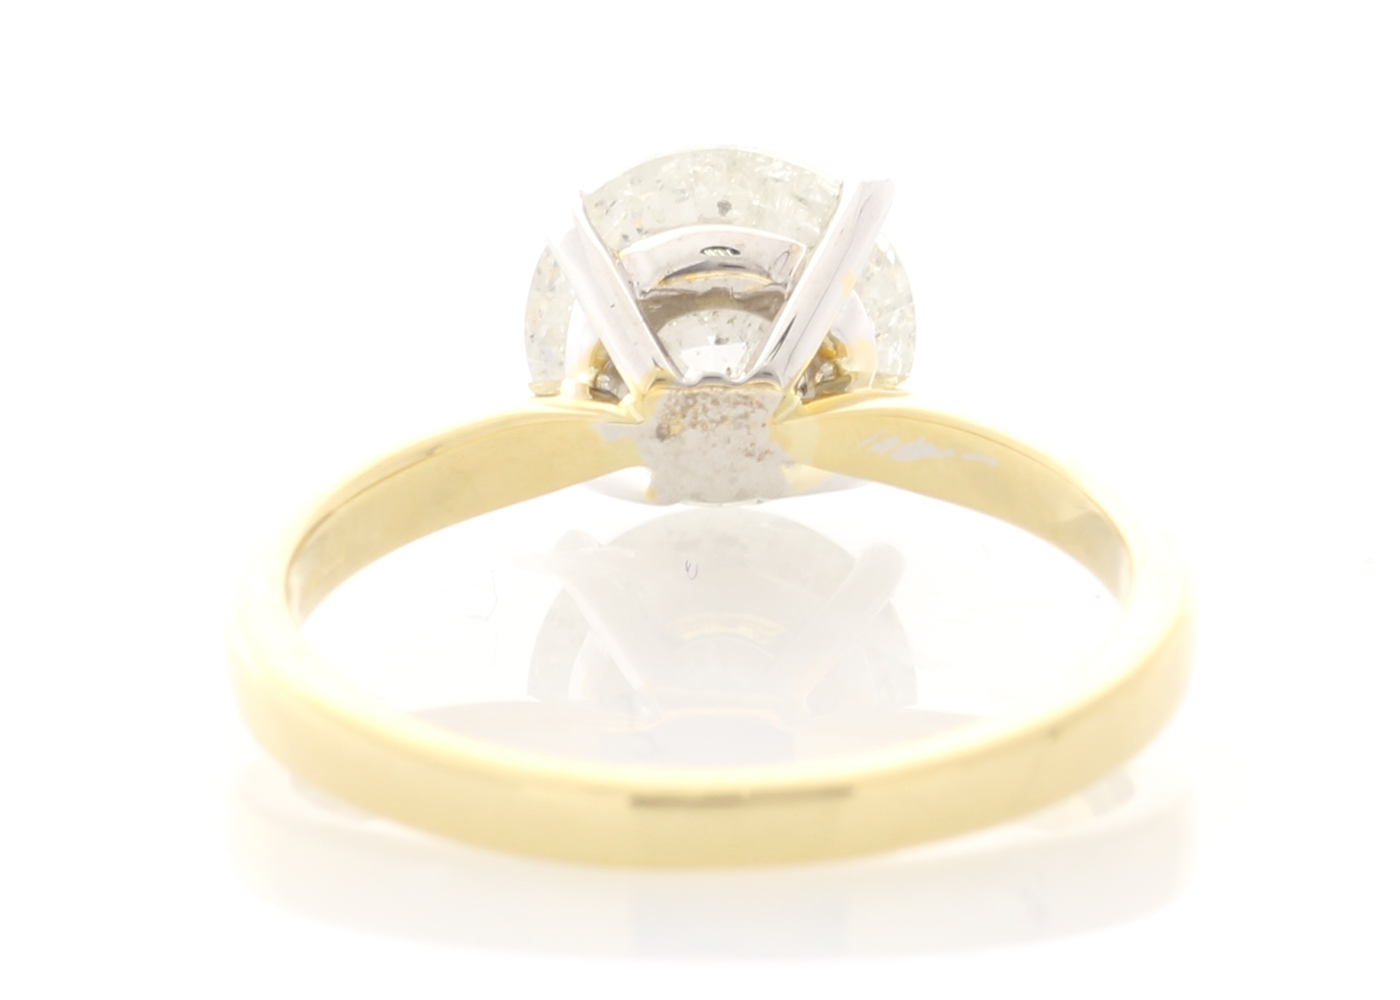 18ct Yellow Gold Prong Set Diamond Ring 2.21 Carats - Image 3 of 5